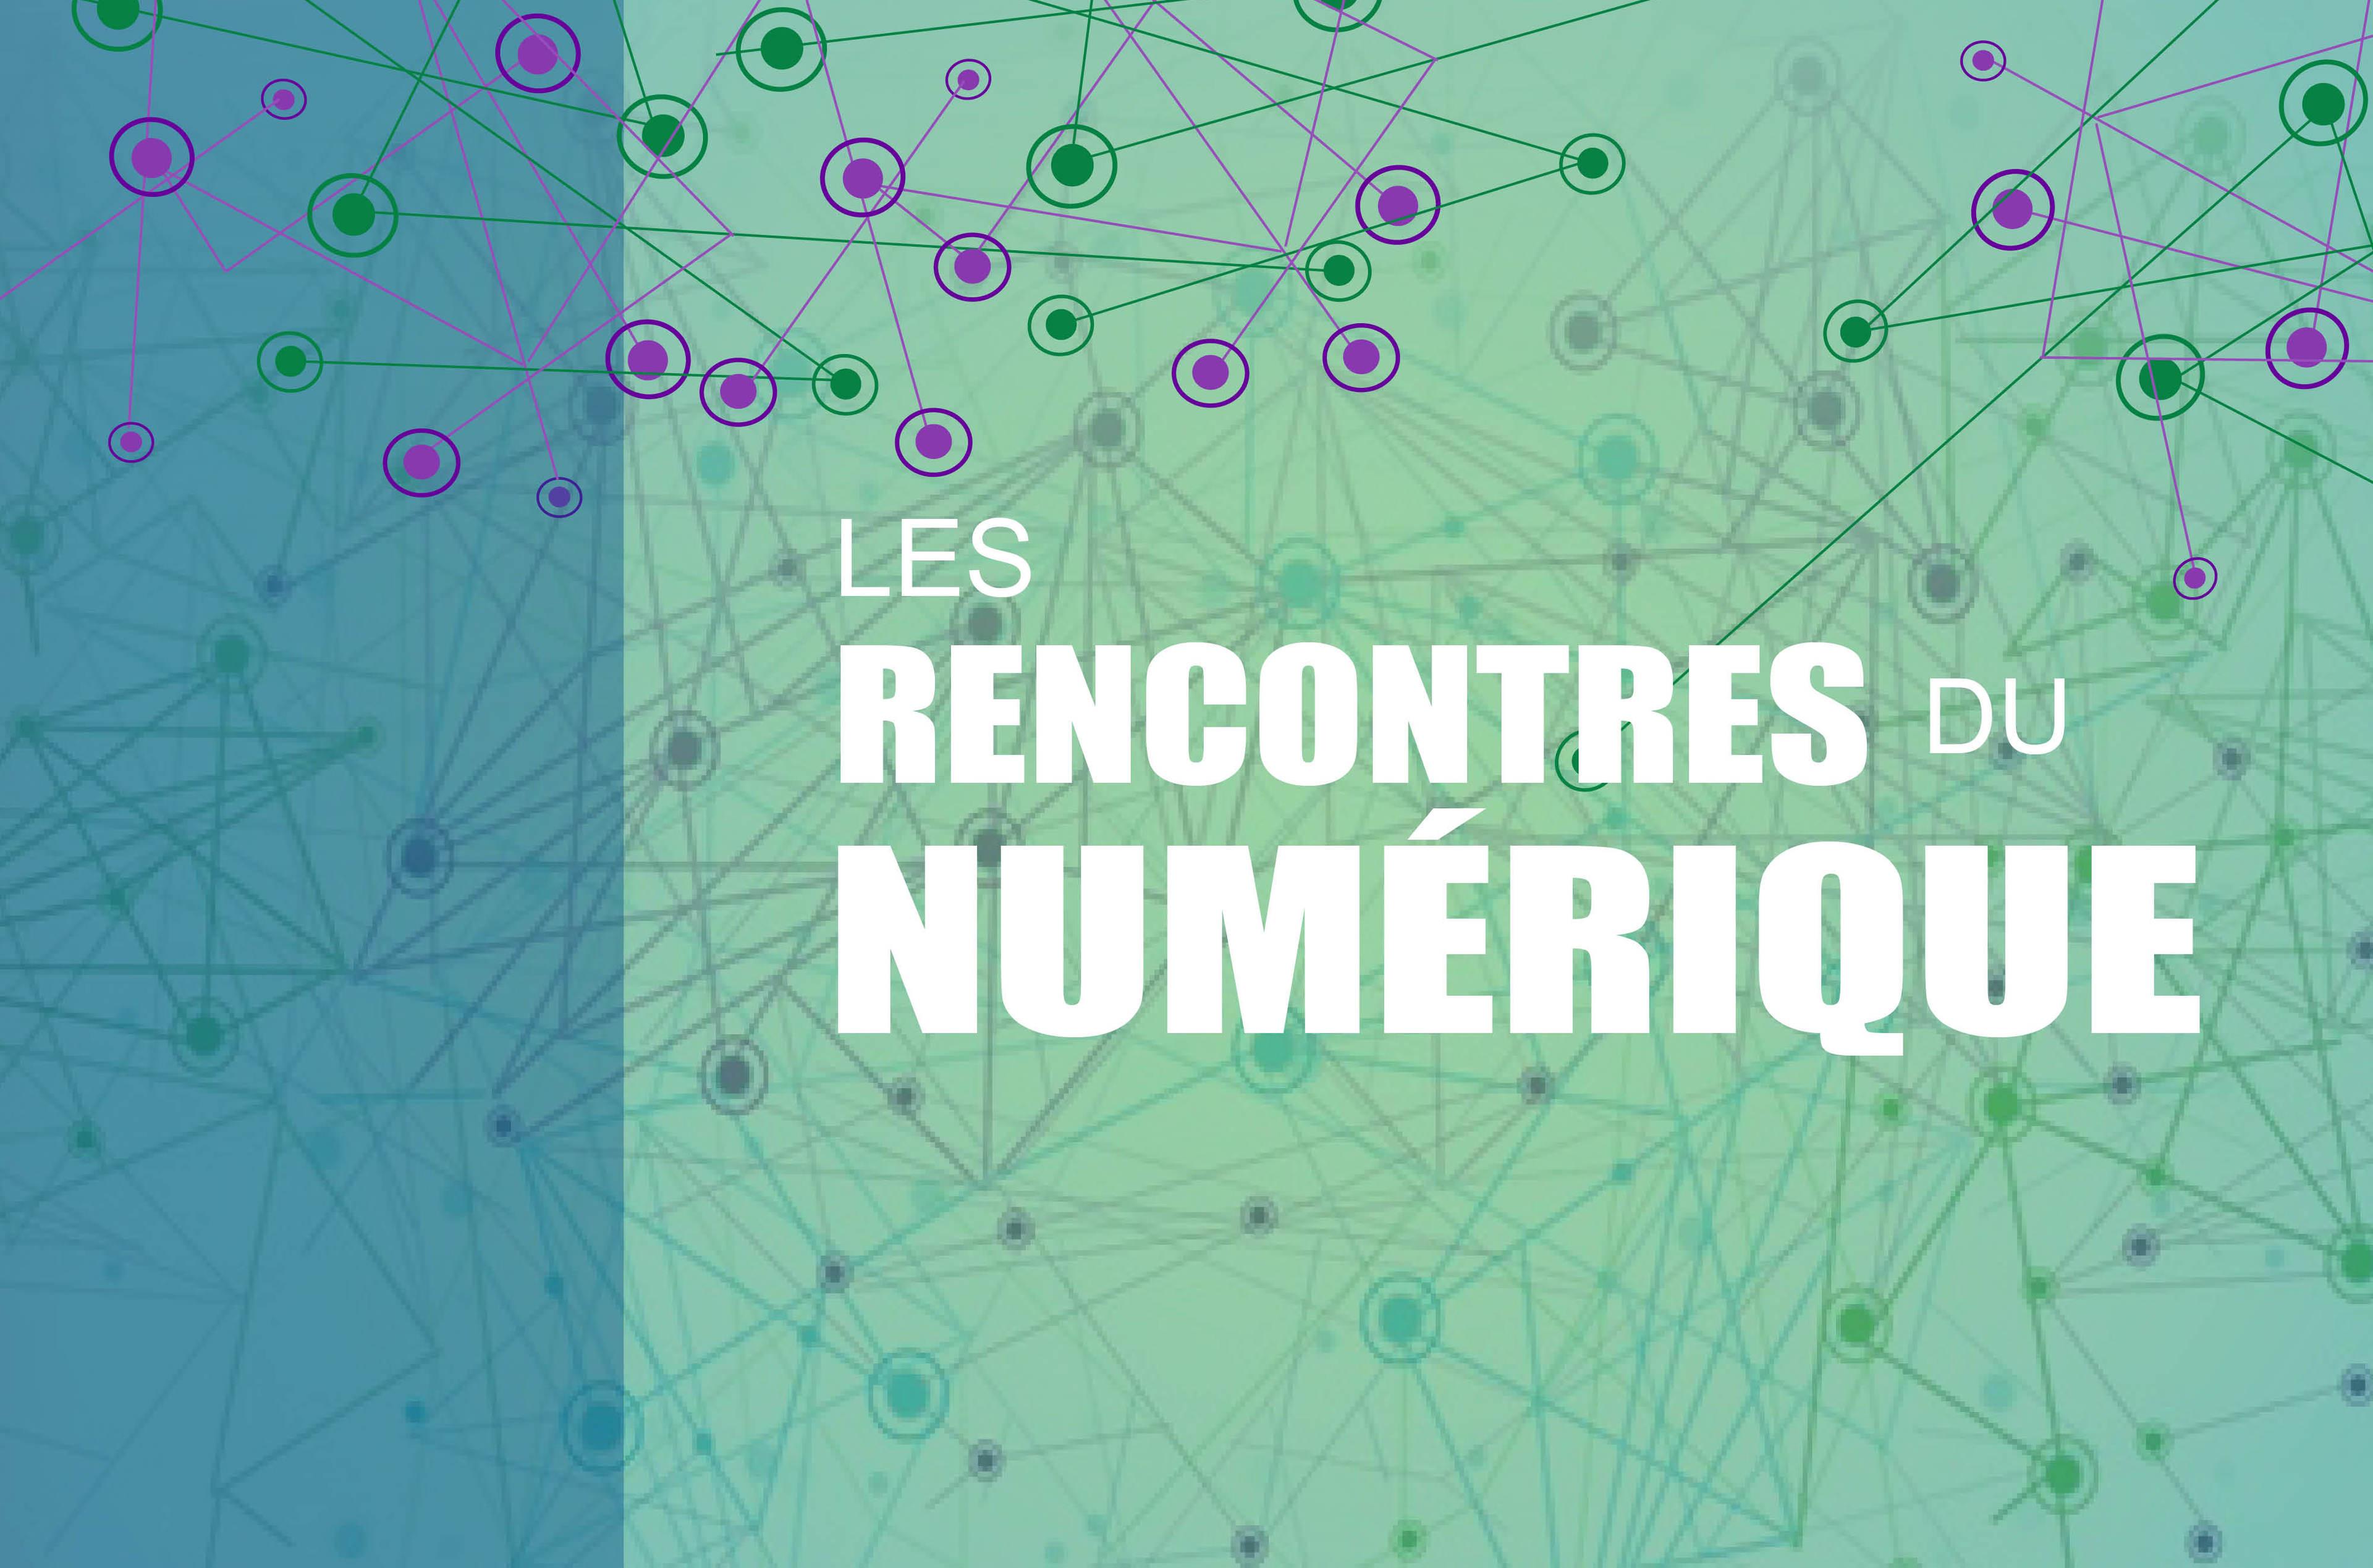 Rencontres numeriques